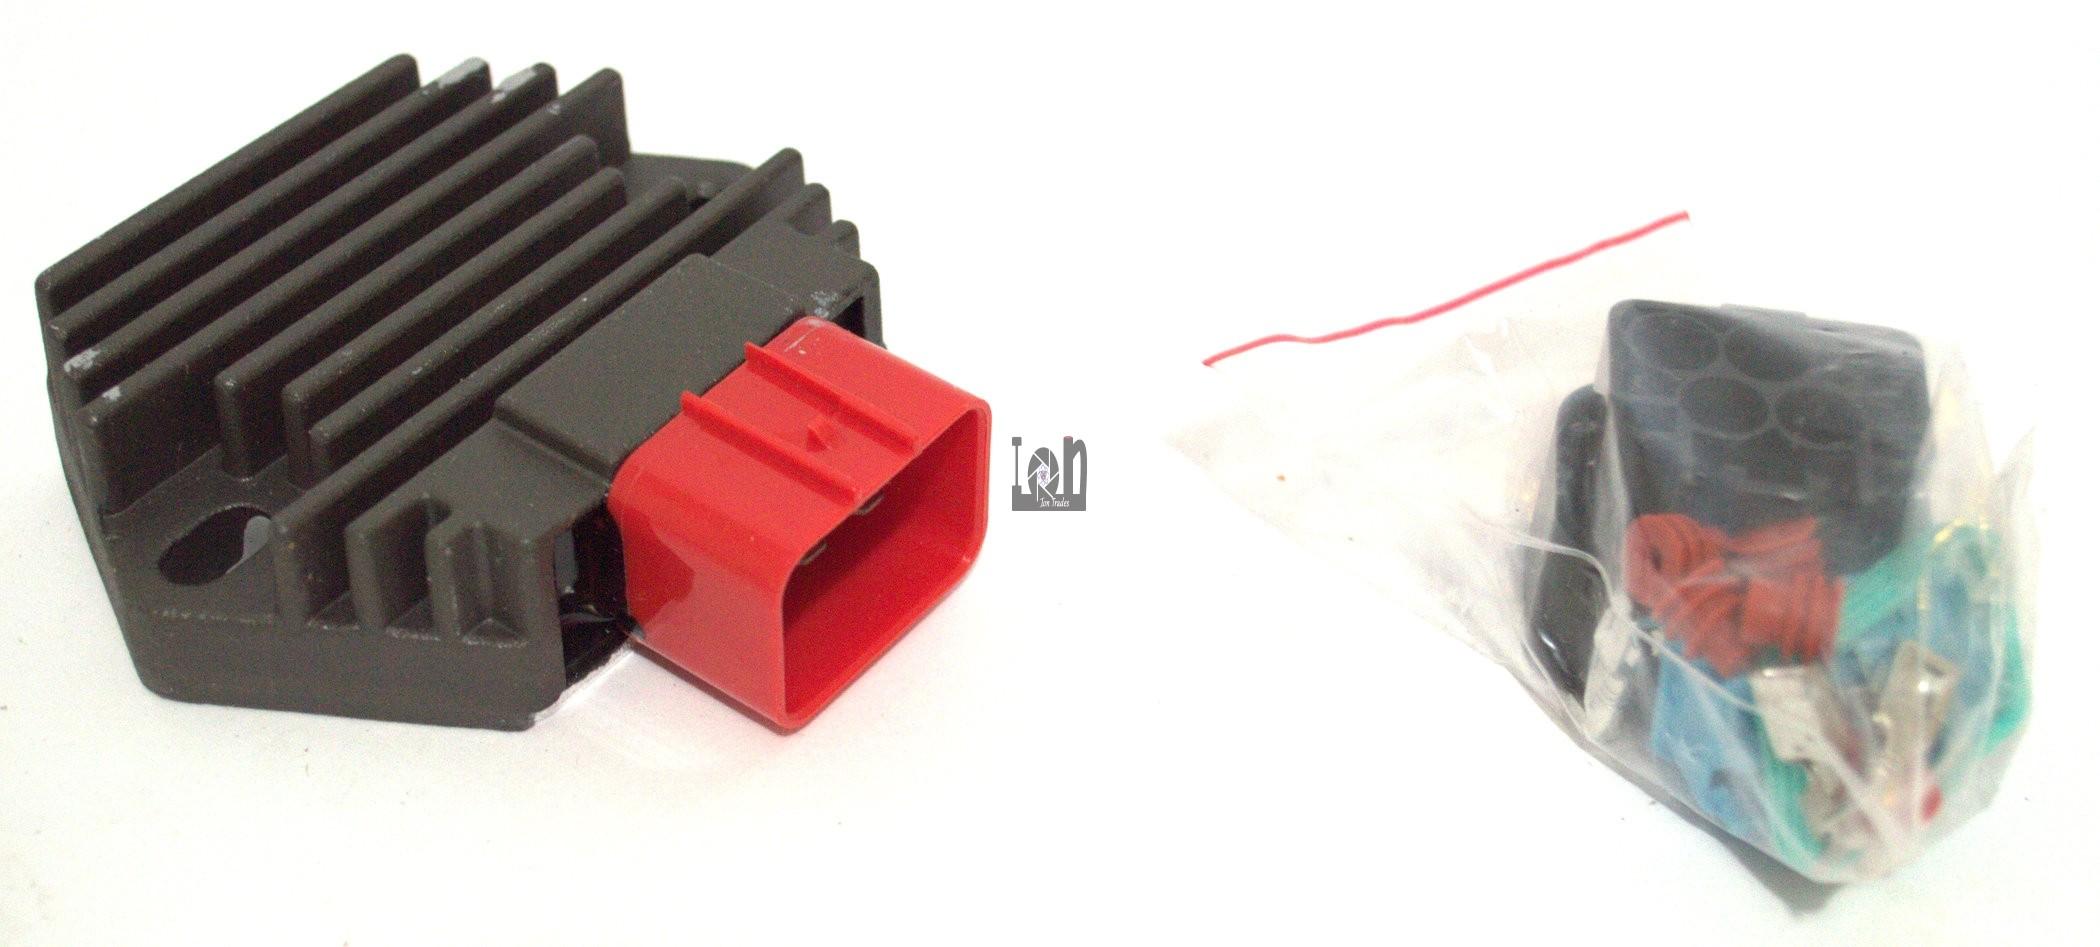 Voltage Regulator FITS Honda TRX Fourtrax Foreman Rancher RTE020-900013